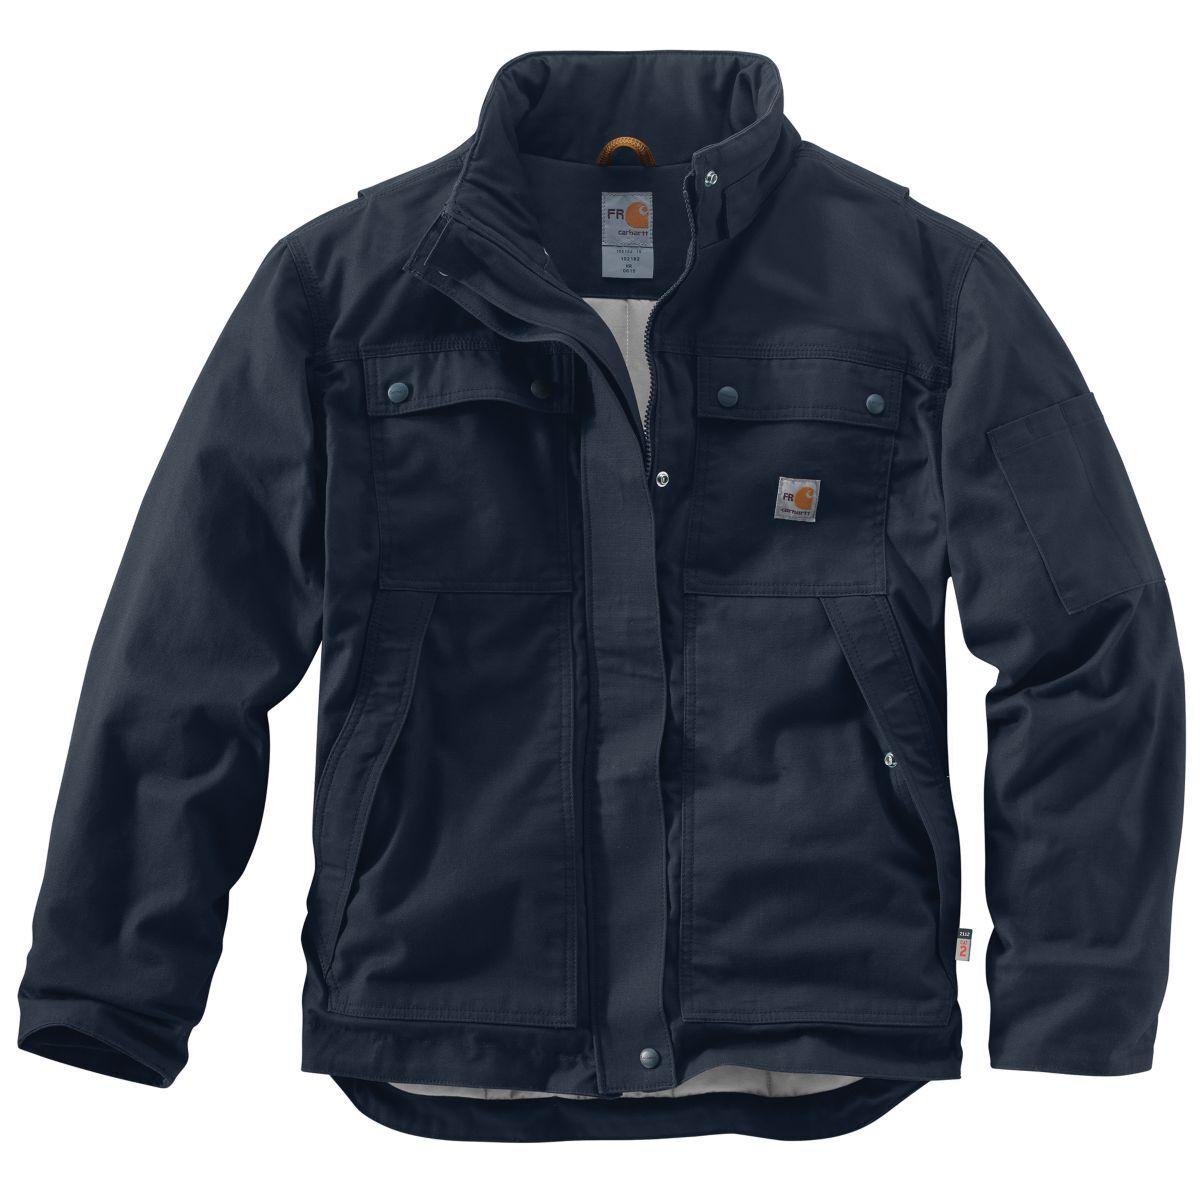 Carhartt Men's Full Swing Quick Duck Coat, Extended Sizes - Blue, XL TALL